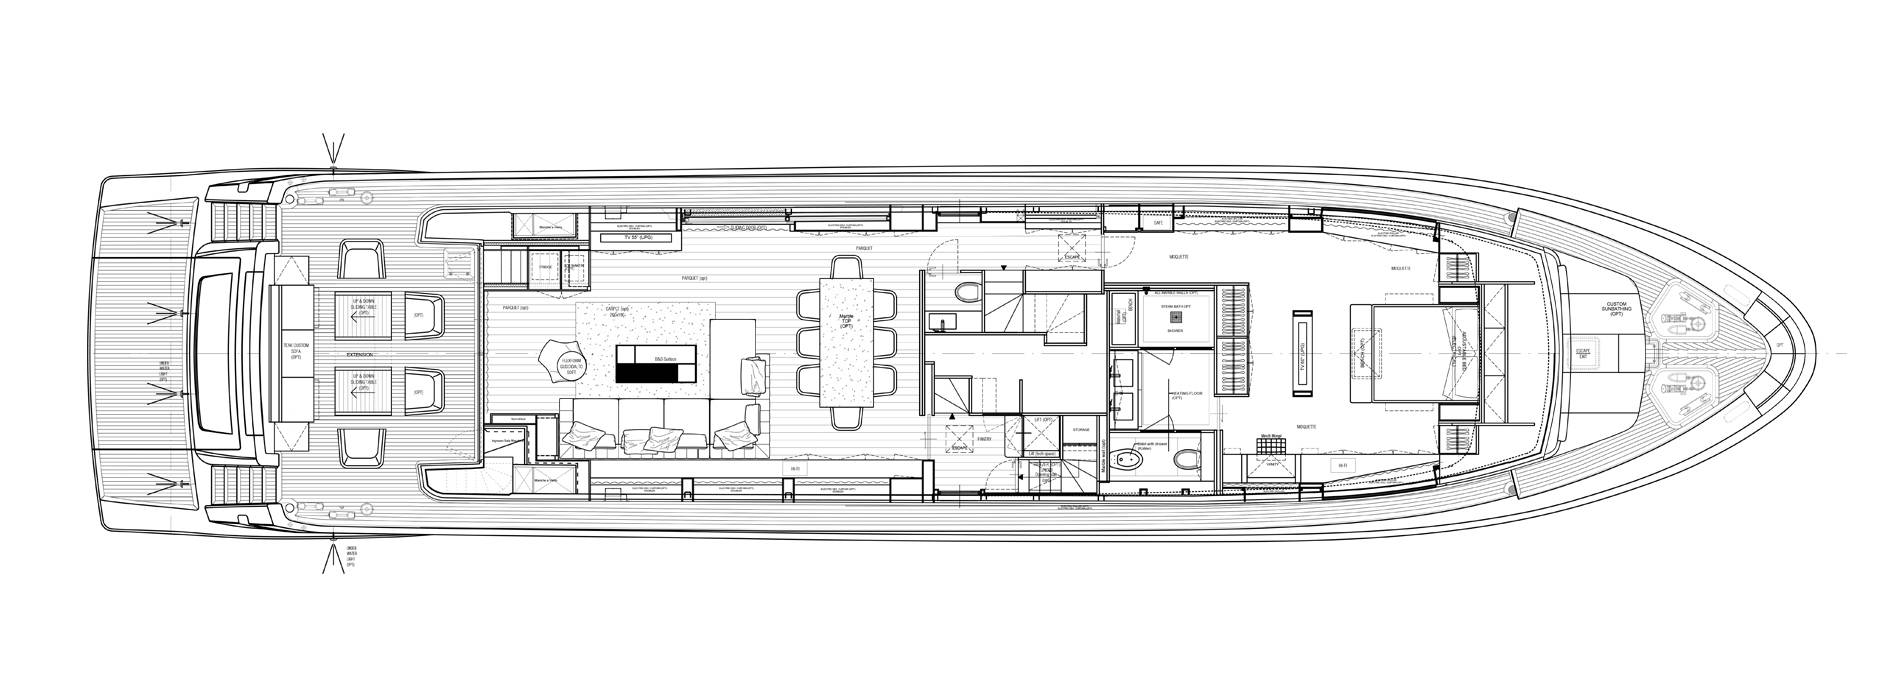 Sanlorenzo Yachts SL106-725 Главная палуба